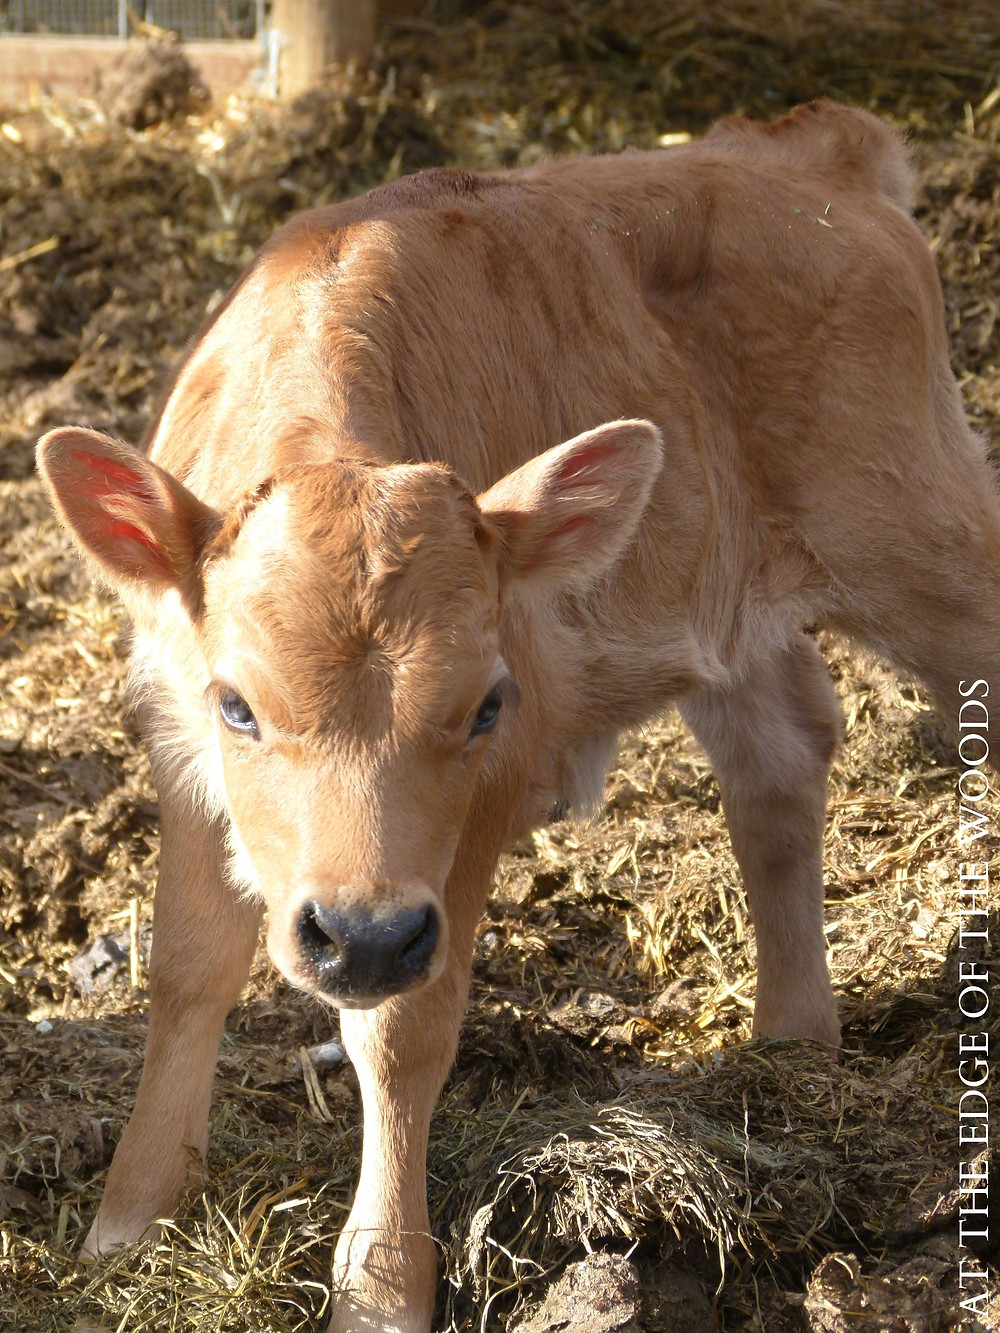 the homestead's calf, Glory